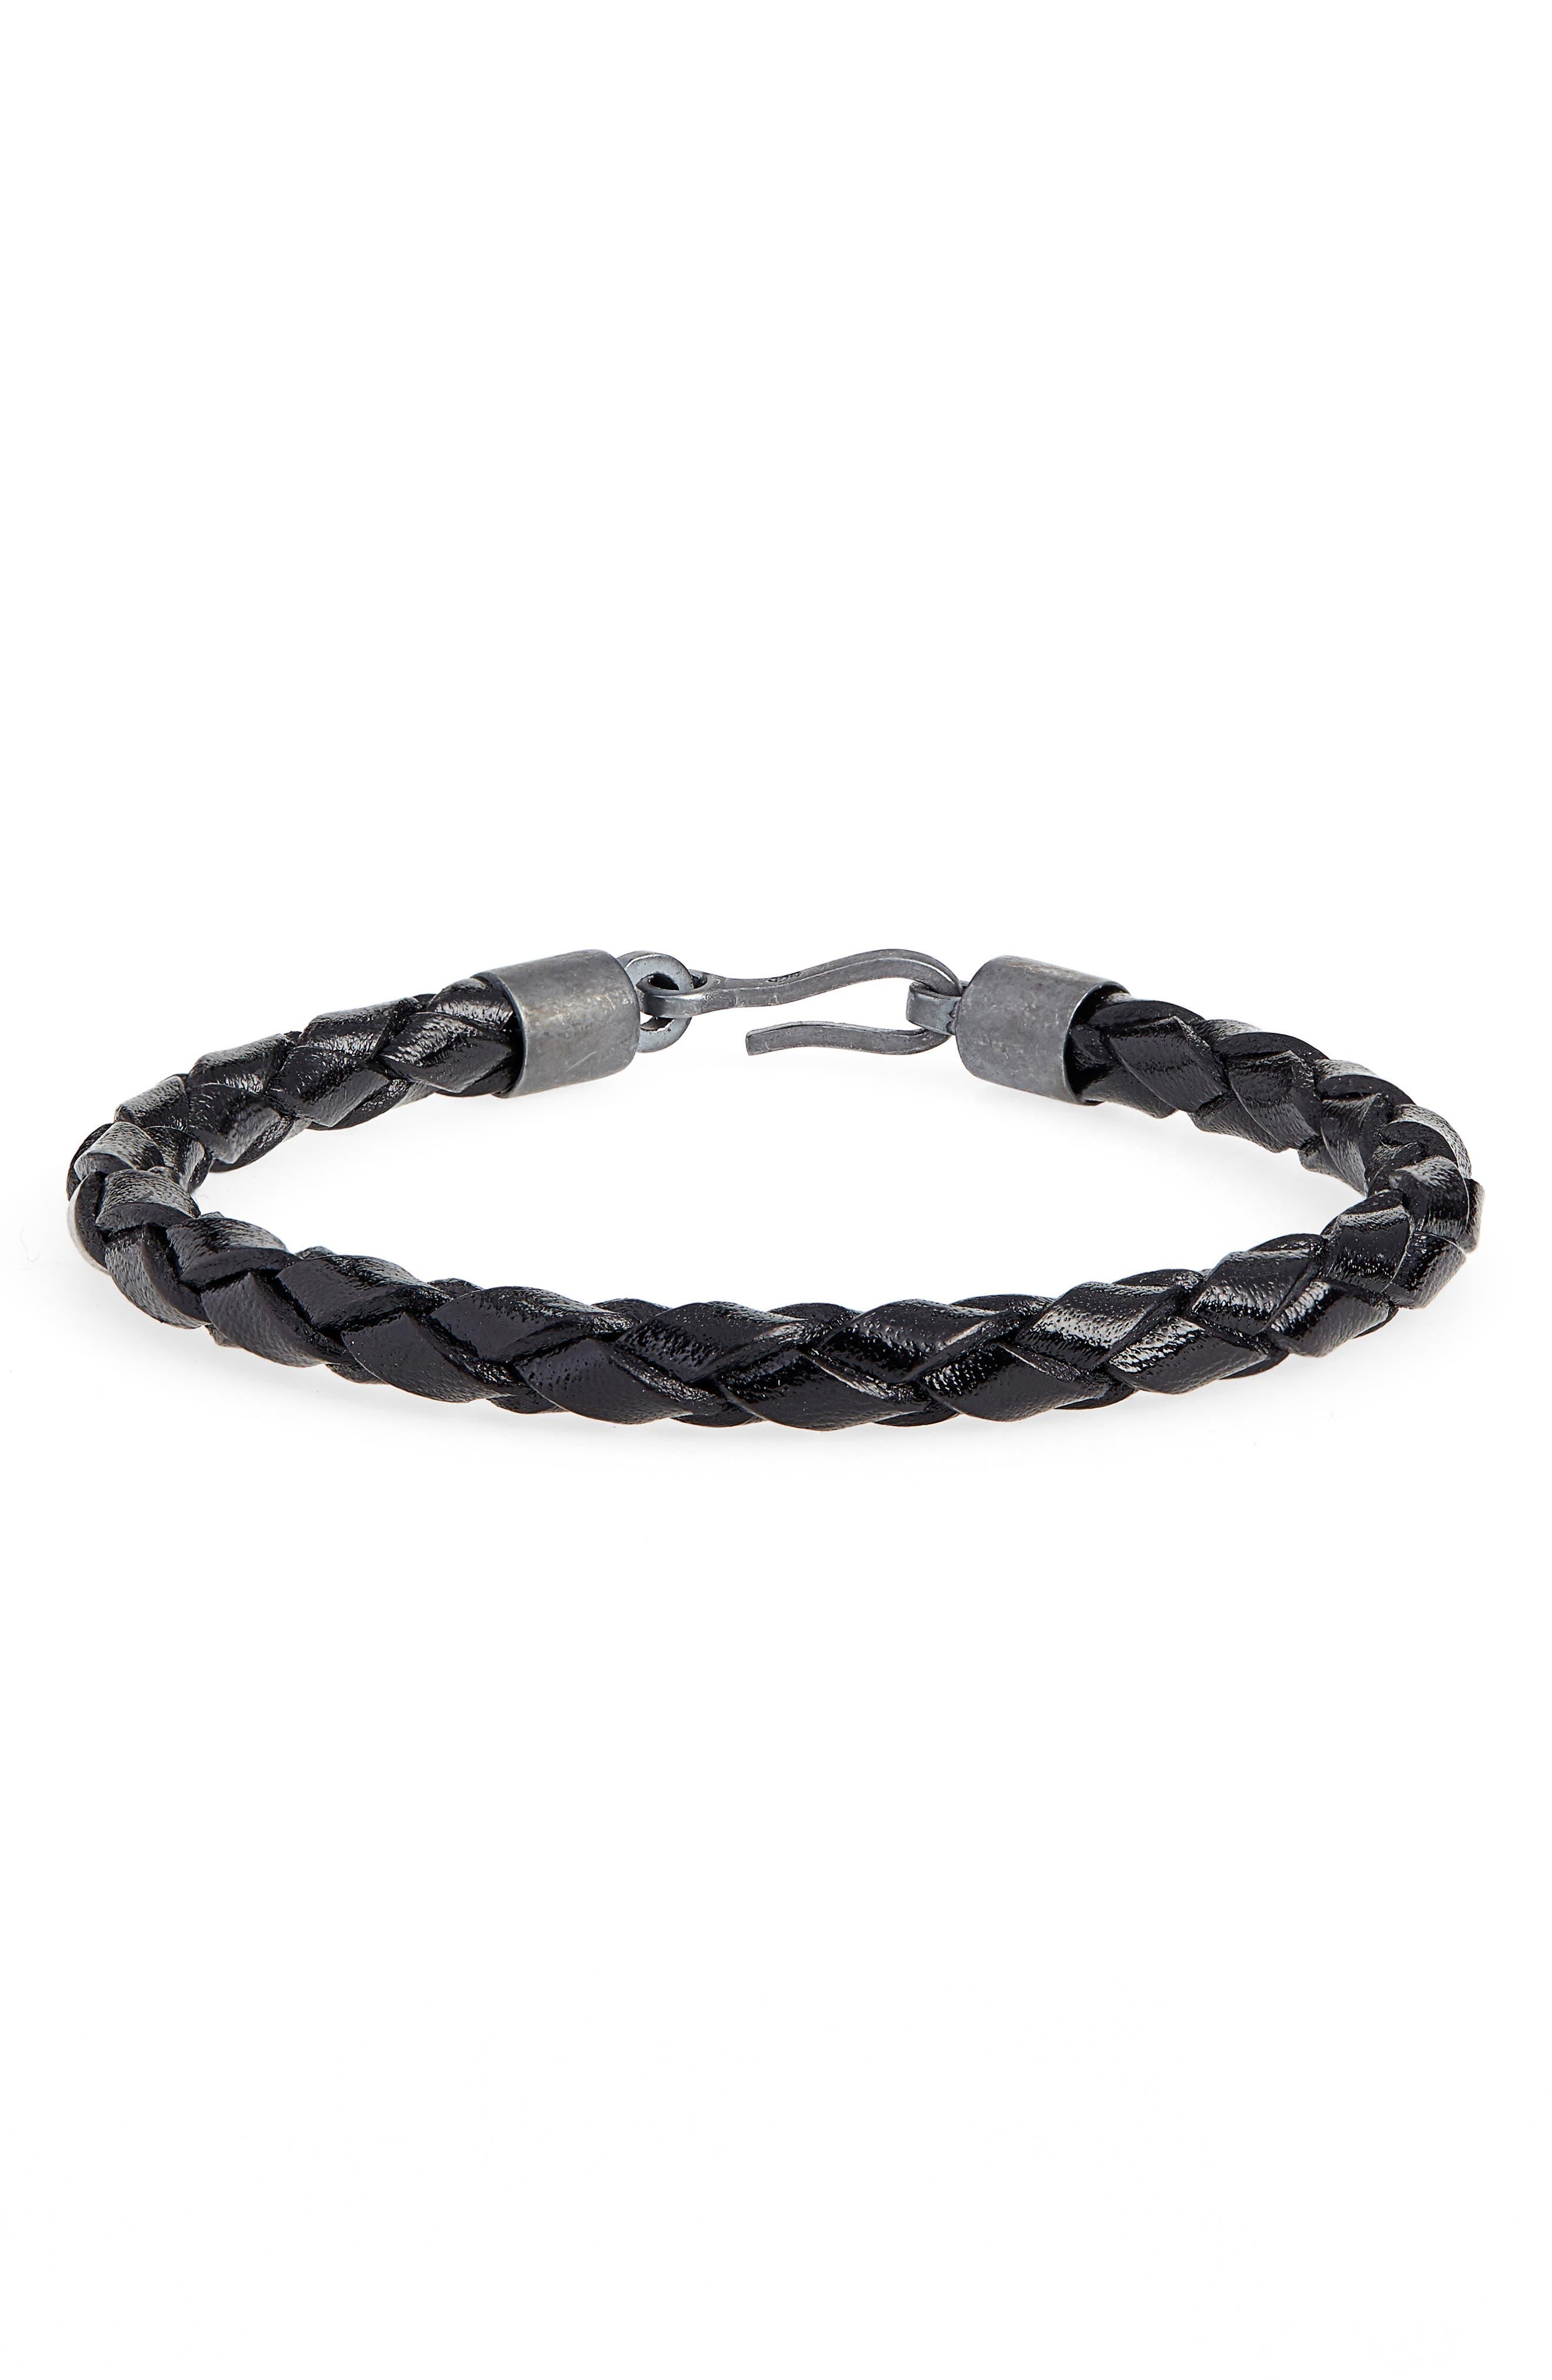 CAPUTO & CO. Braided Leather Bracelet in Black